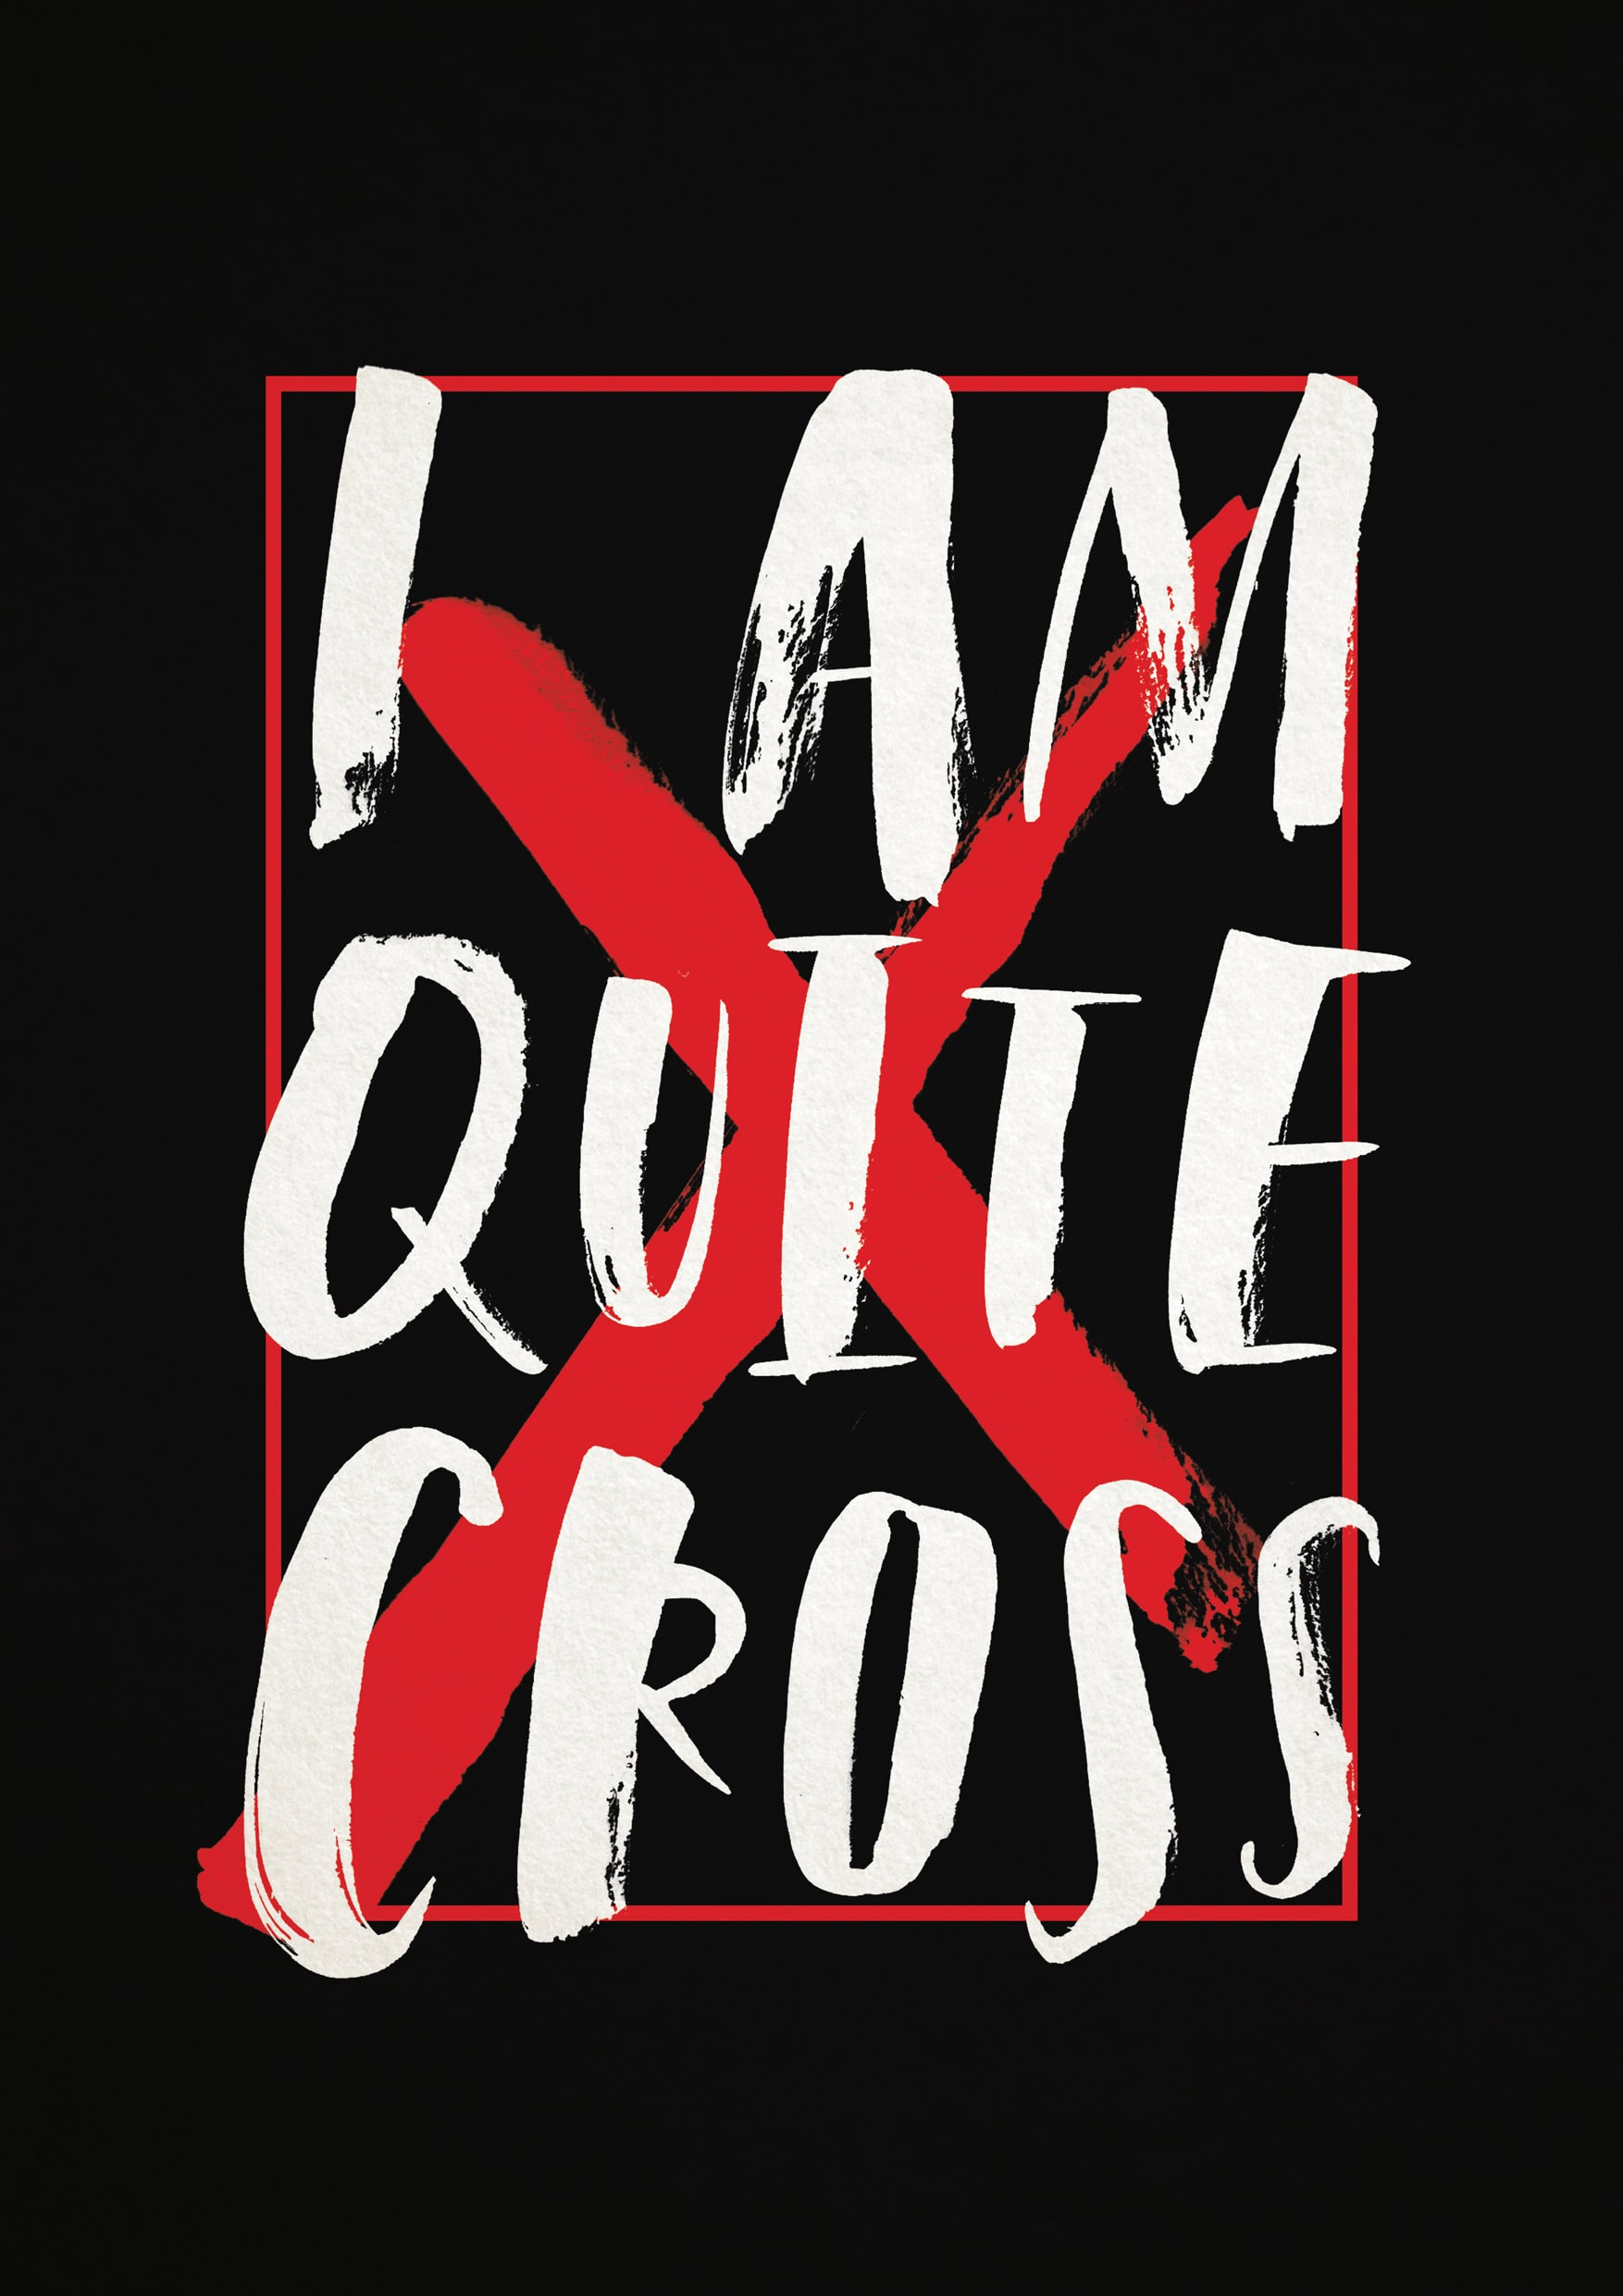 I_am_quite_cross_Website-EmilieSheehan.jpg